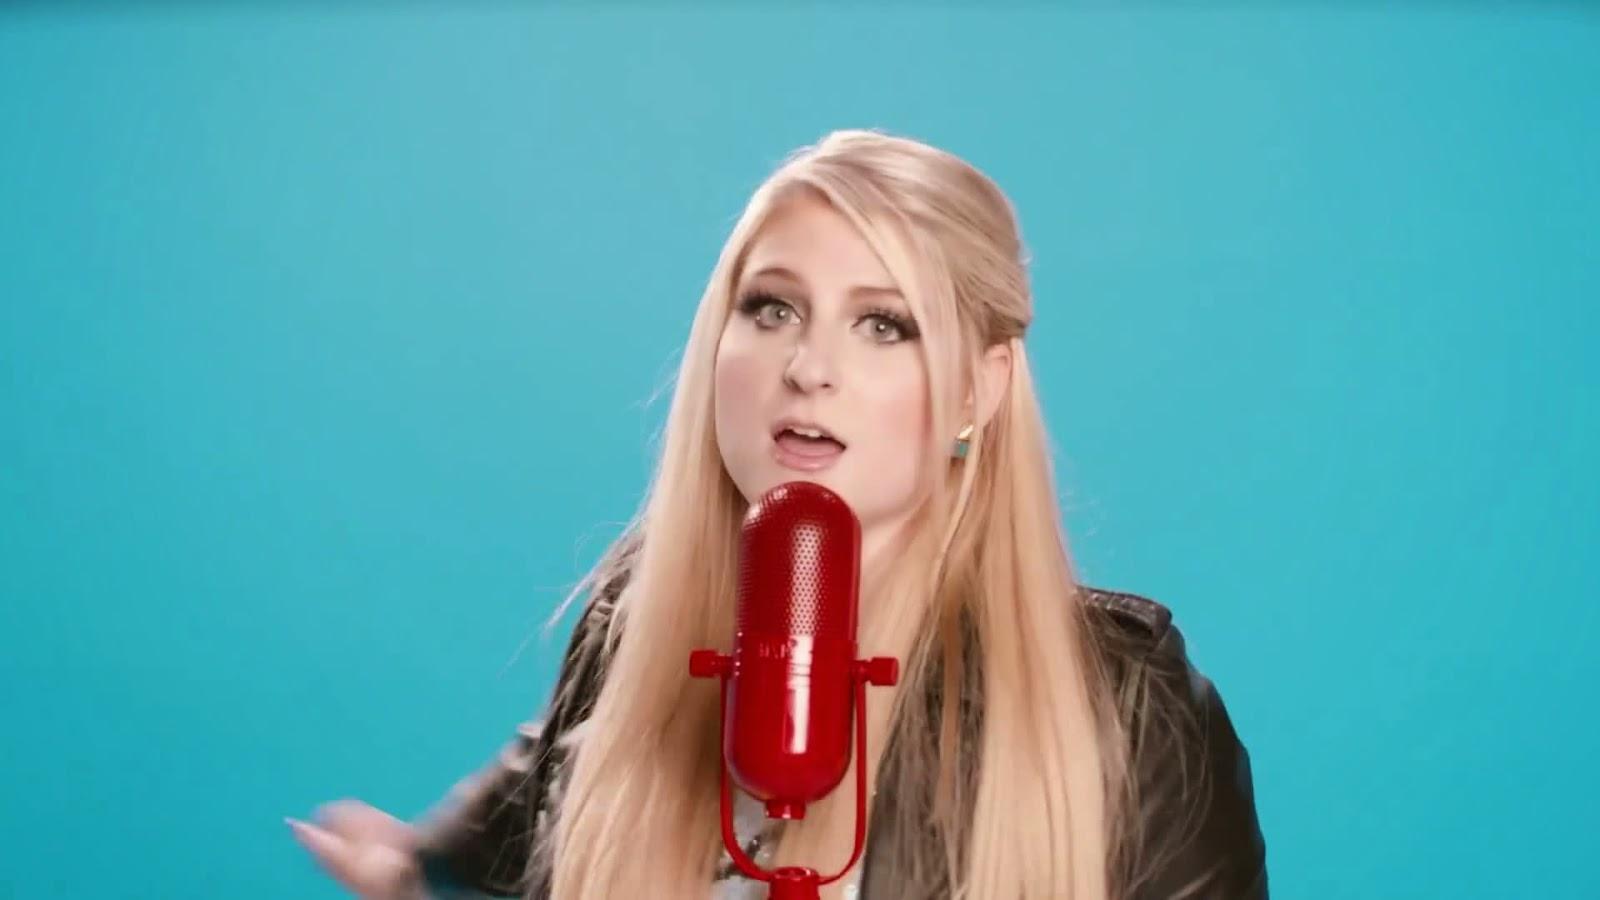 Meghan Trainor Lips Are Moving | Hot Girl HD Wallpaper